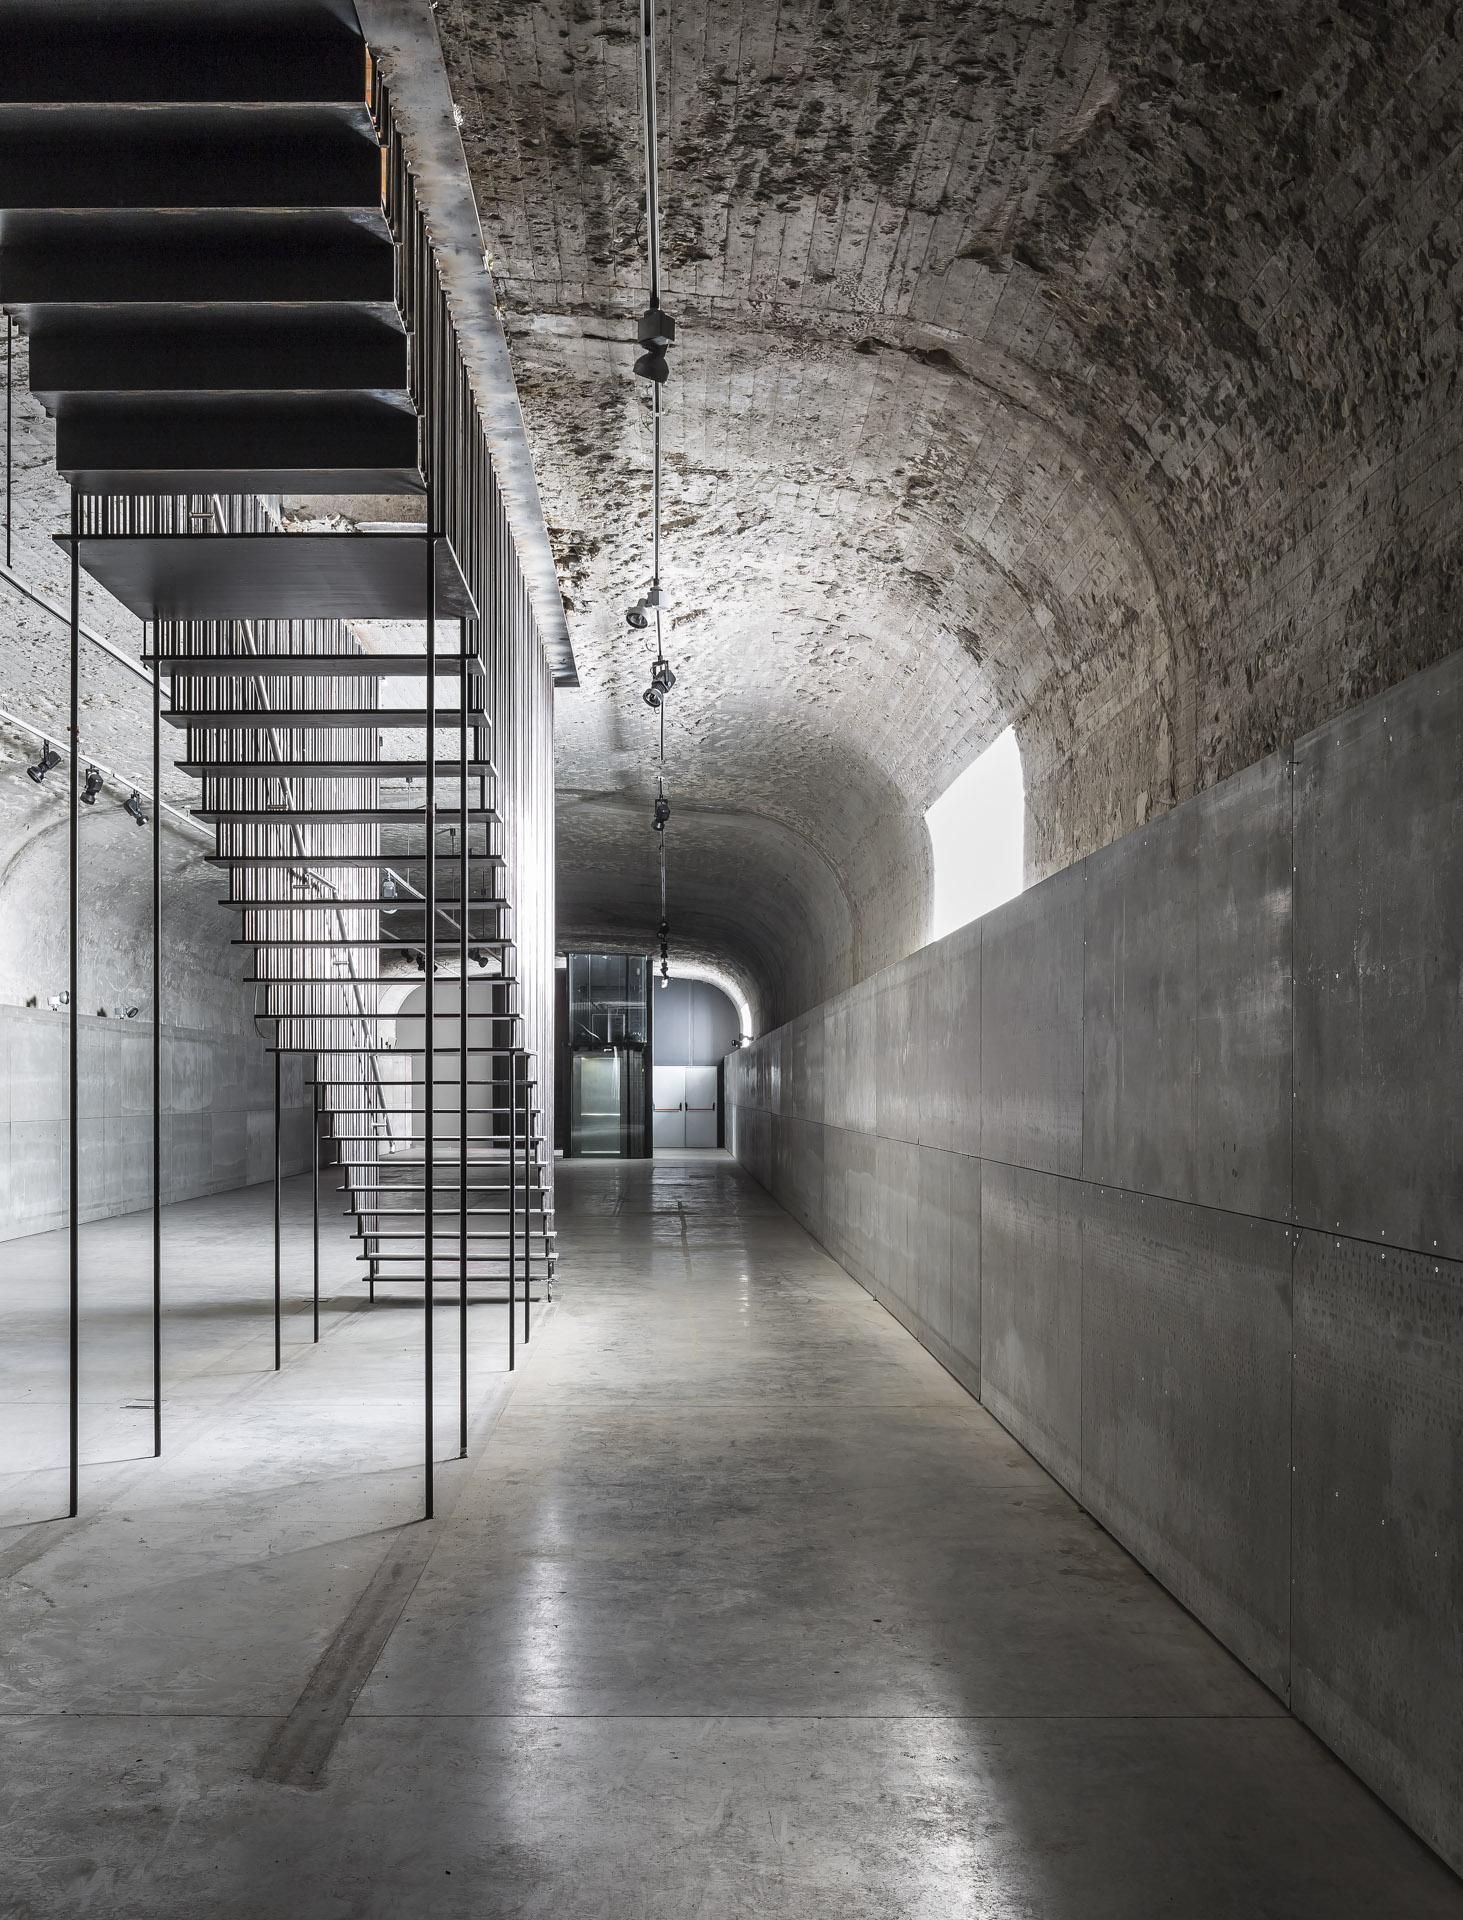 fotografia-arquitectura-madrid-nuevos-ministerios-elorza-german-cabo-14